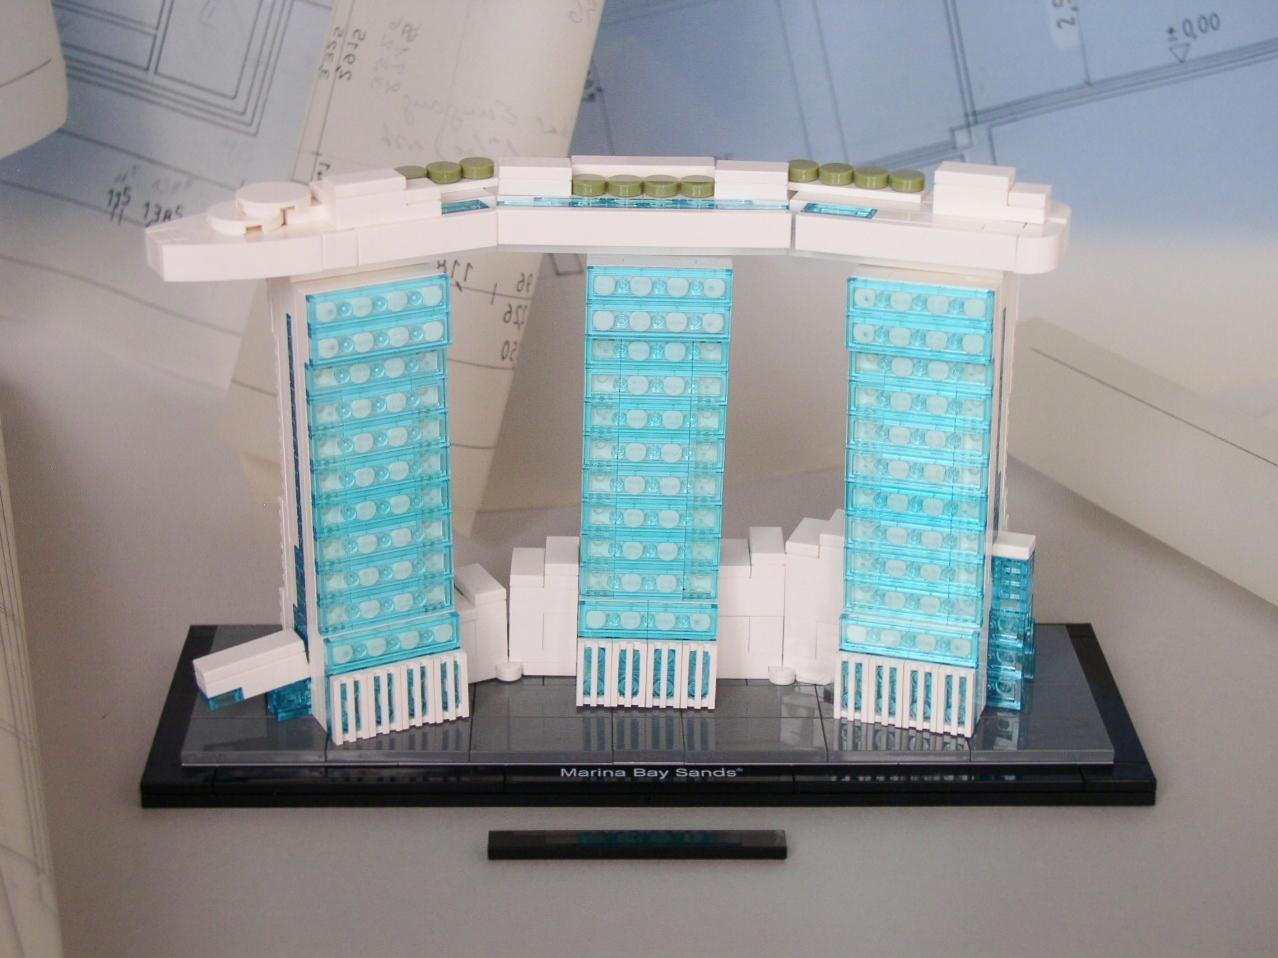 Lego 21021 architecture marina bay sands original mit for Marina bay sands architecture concept